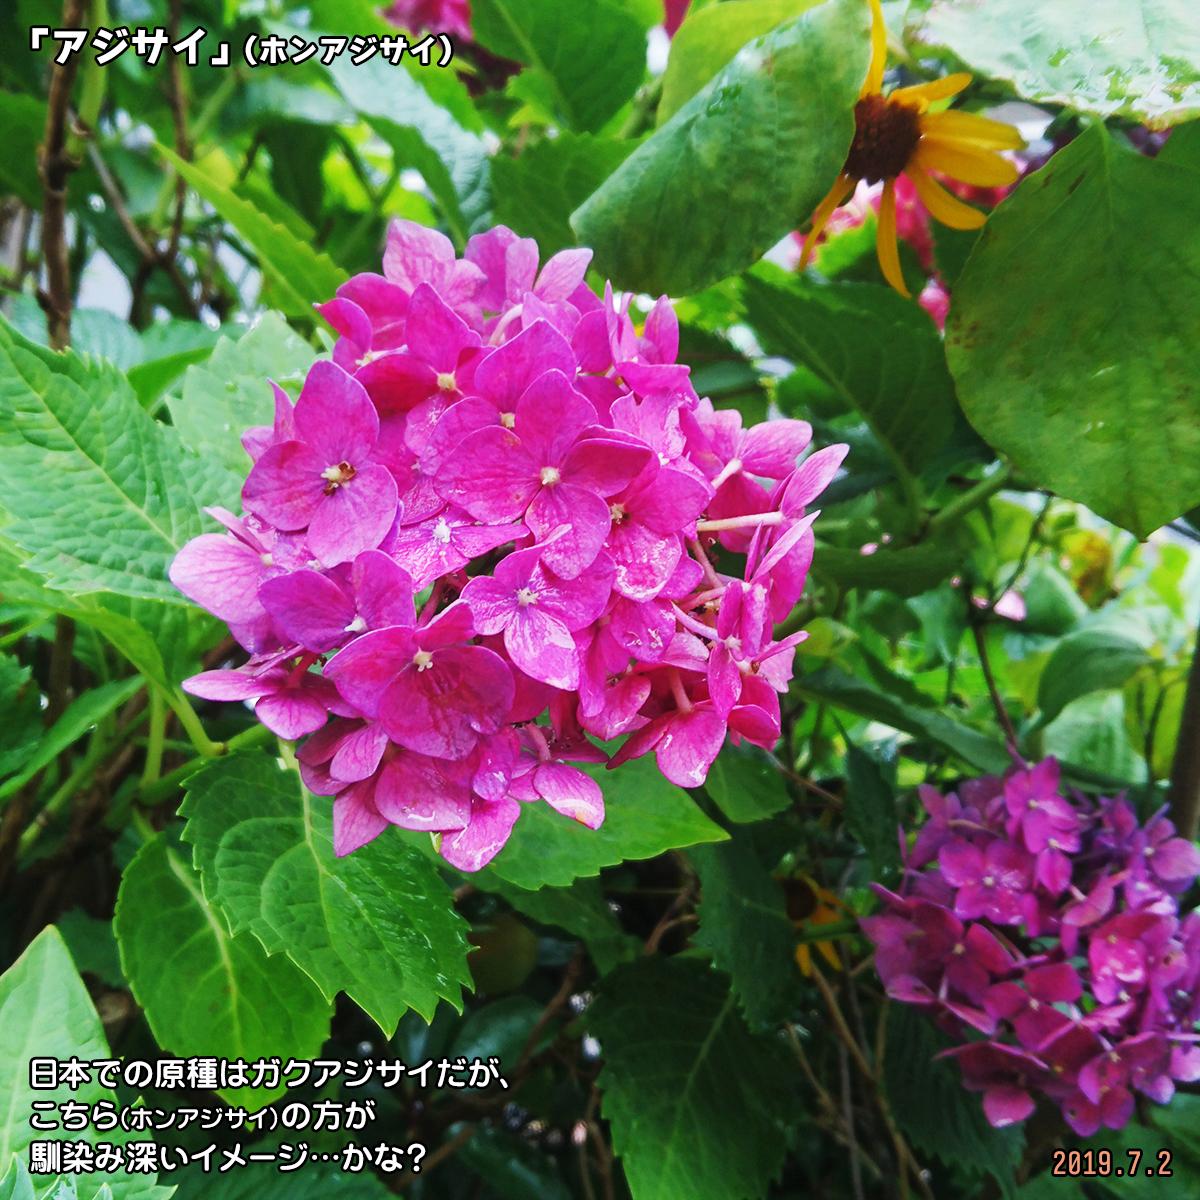 DSC_0903-(1)_20190924172948531.jpg